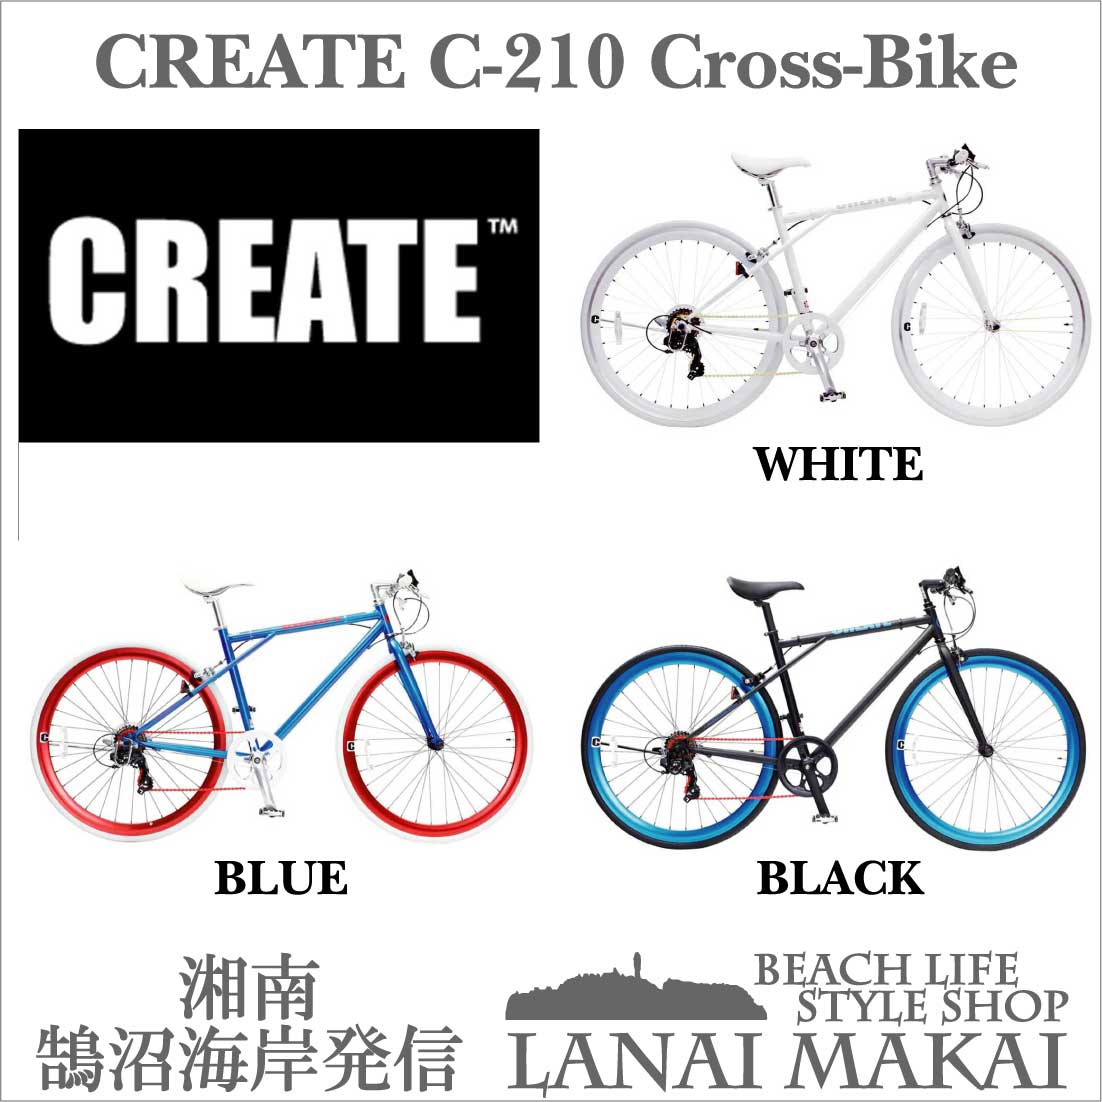 "【CREATE BIKES C-210 CROSS-BIKE】外装6段変速 クロスバイク""湘南鵠沼海岸発信""自転車 ロードバイク メンズ レディース 700C クリエイトバイク"